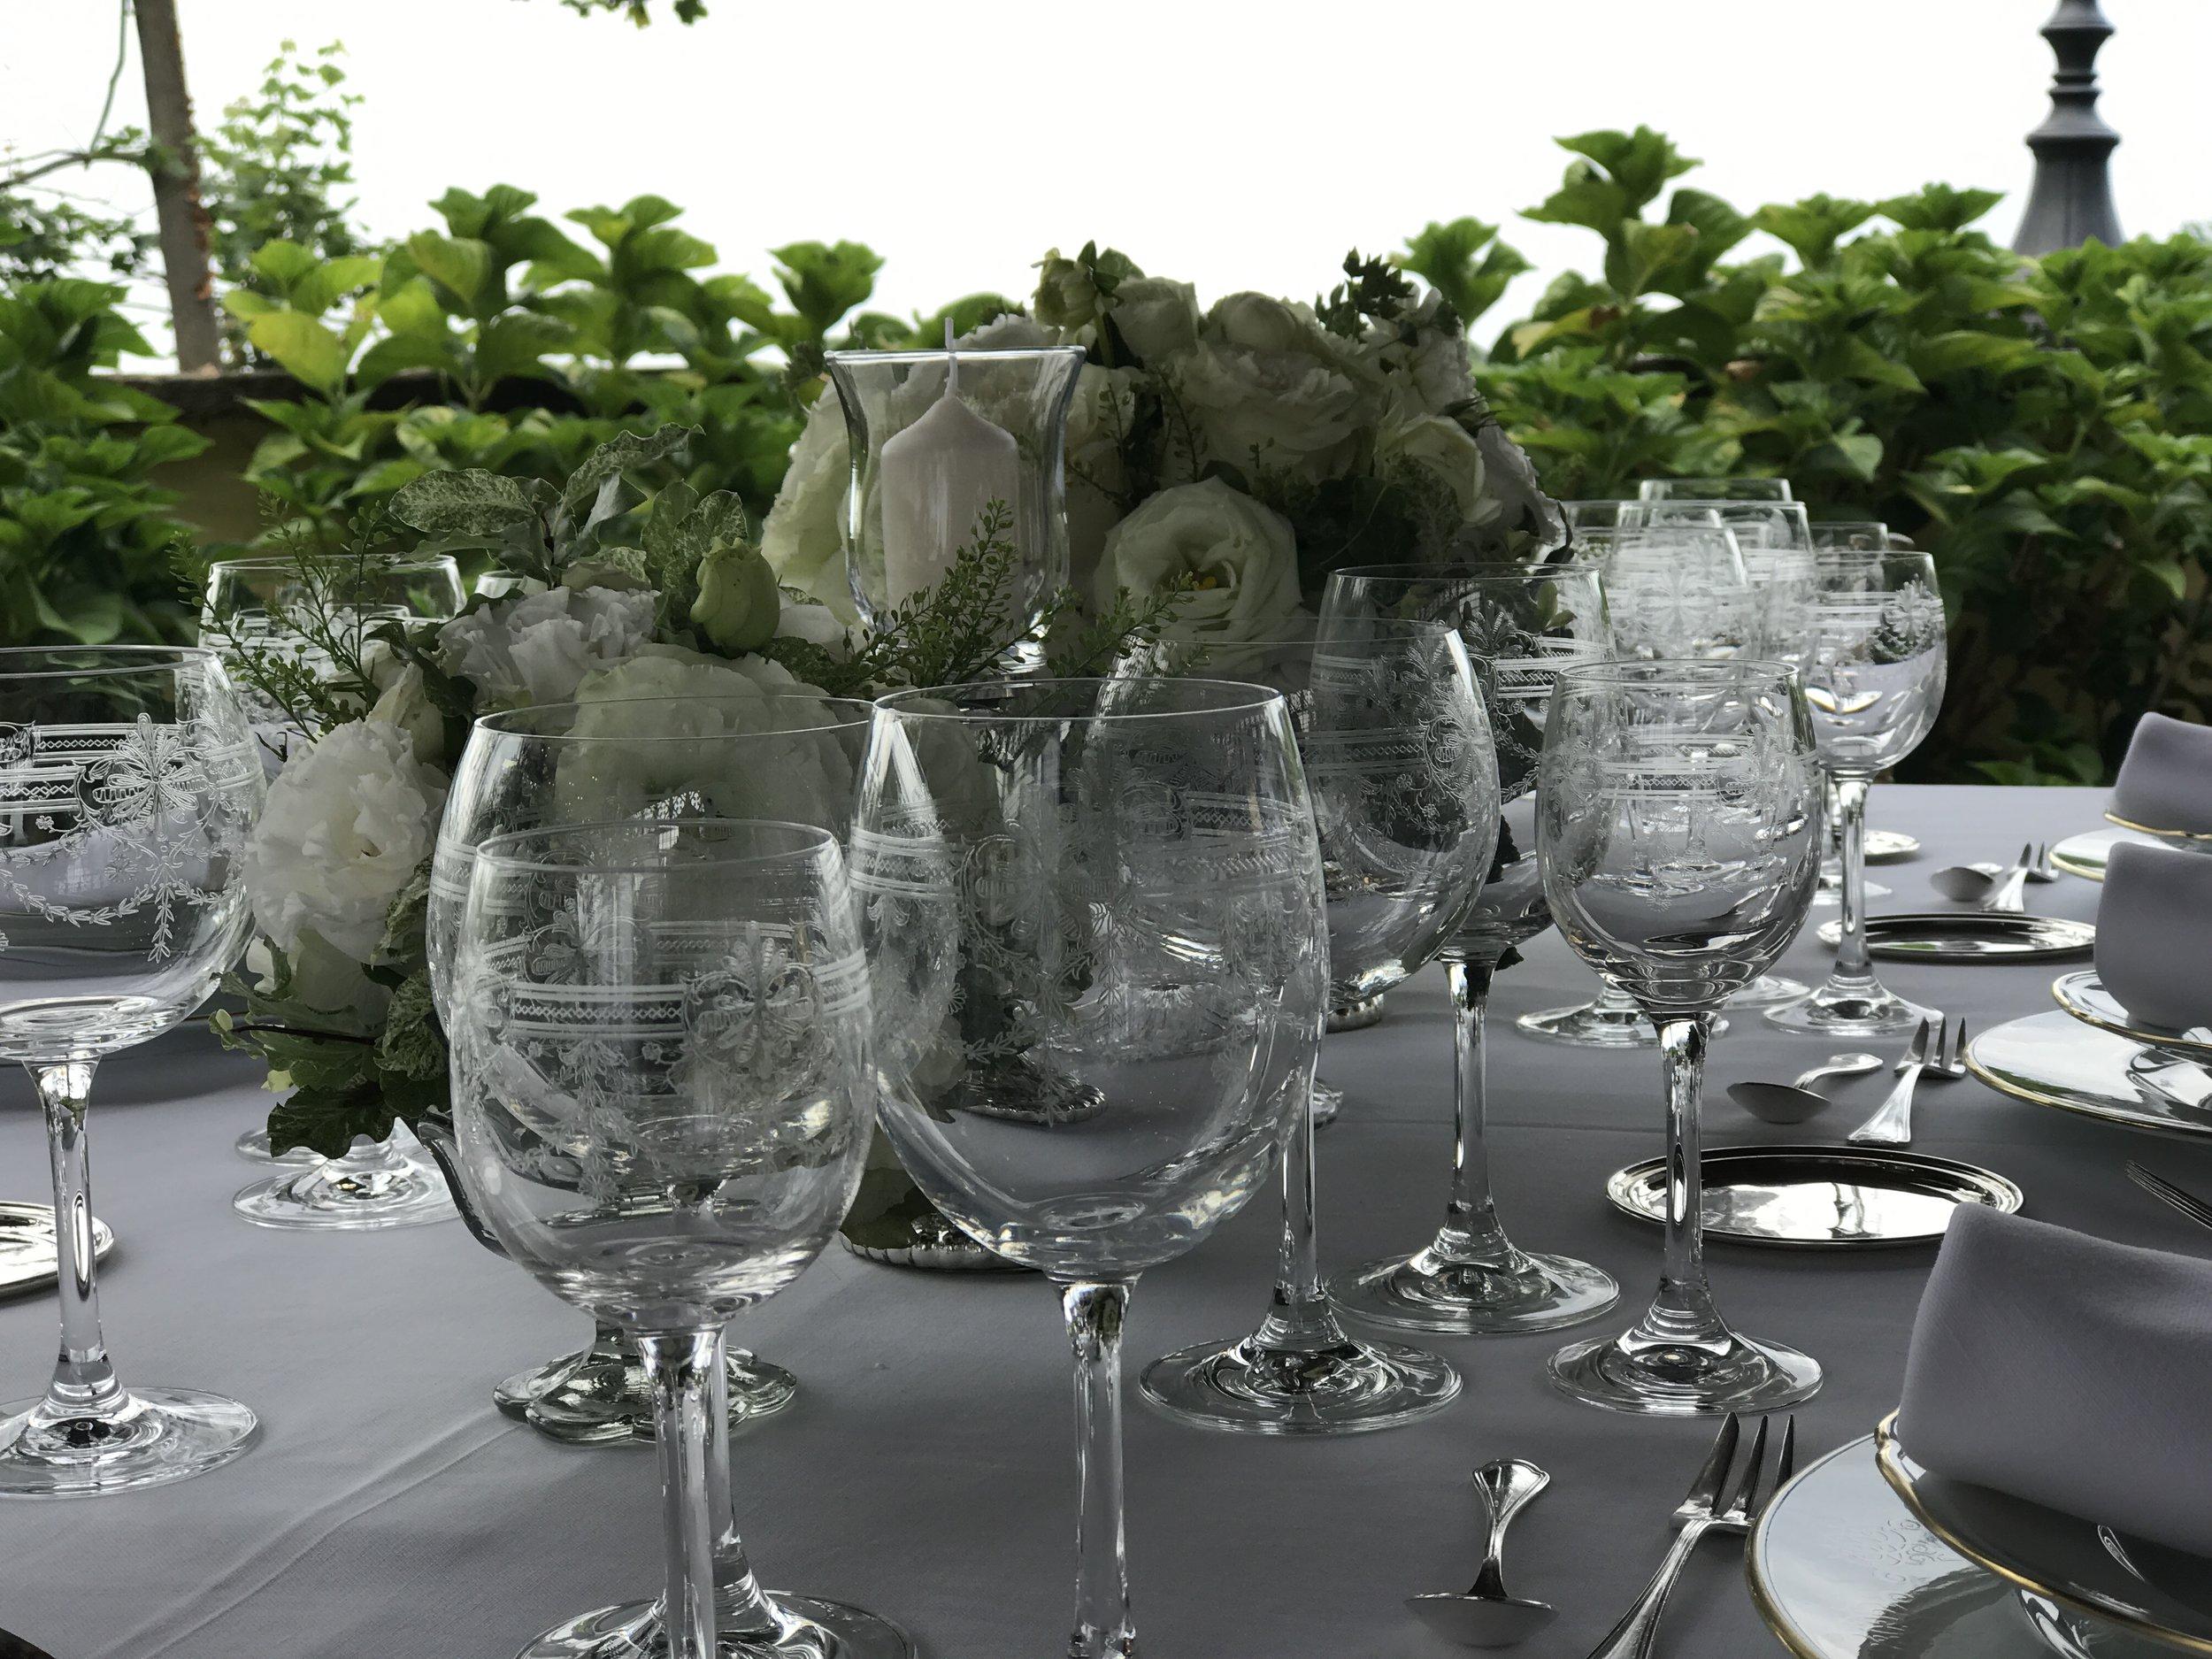 alex-edge-destination-wedding-italy-6.JPG